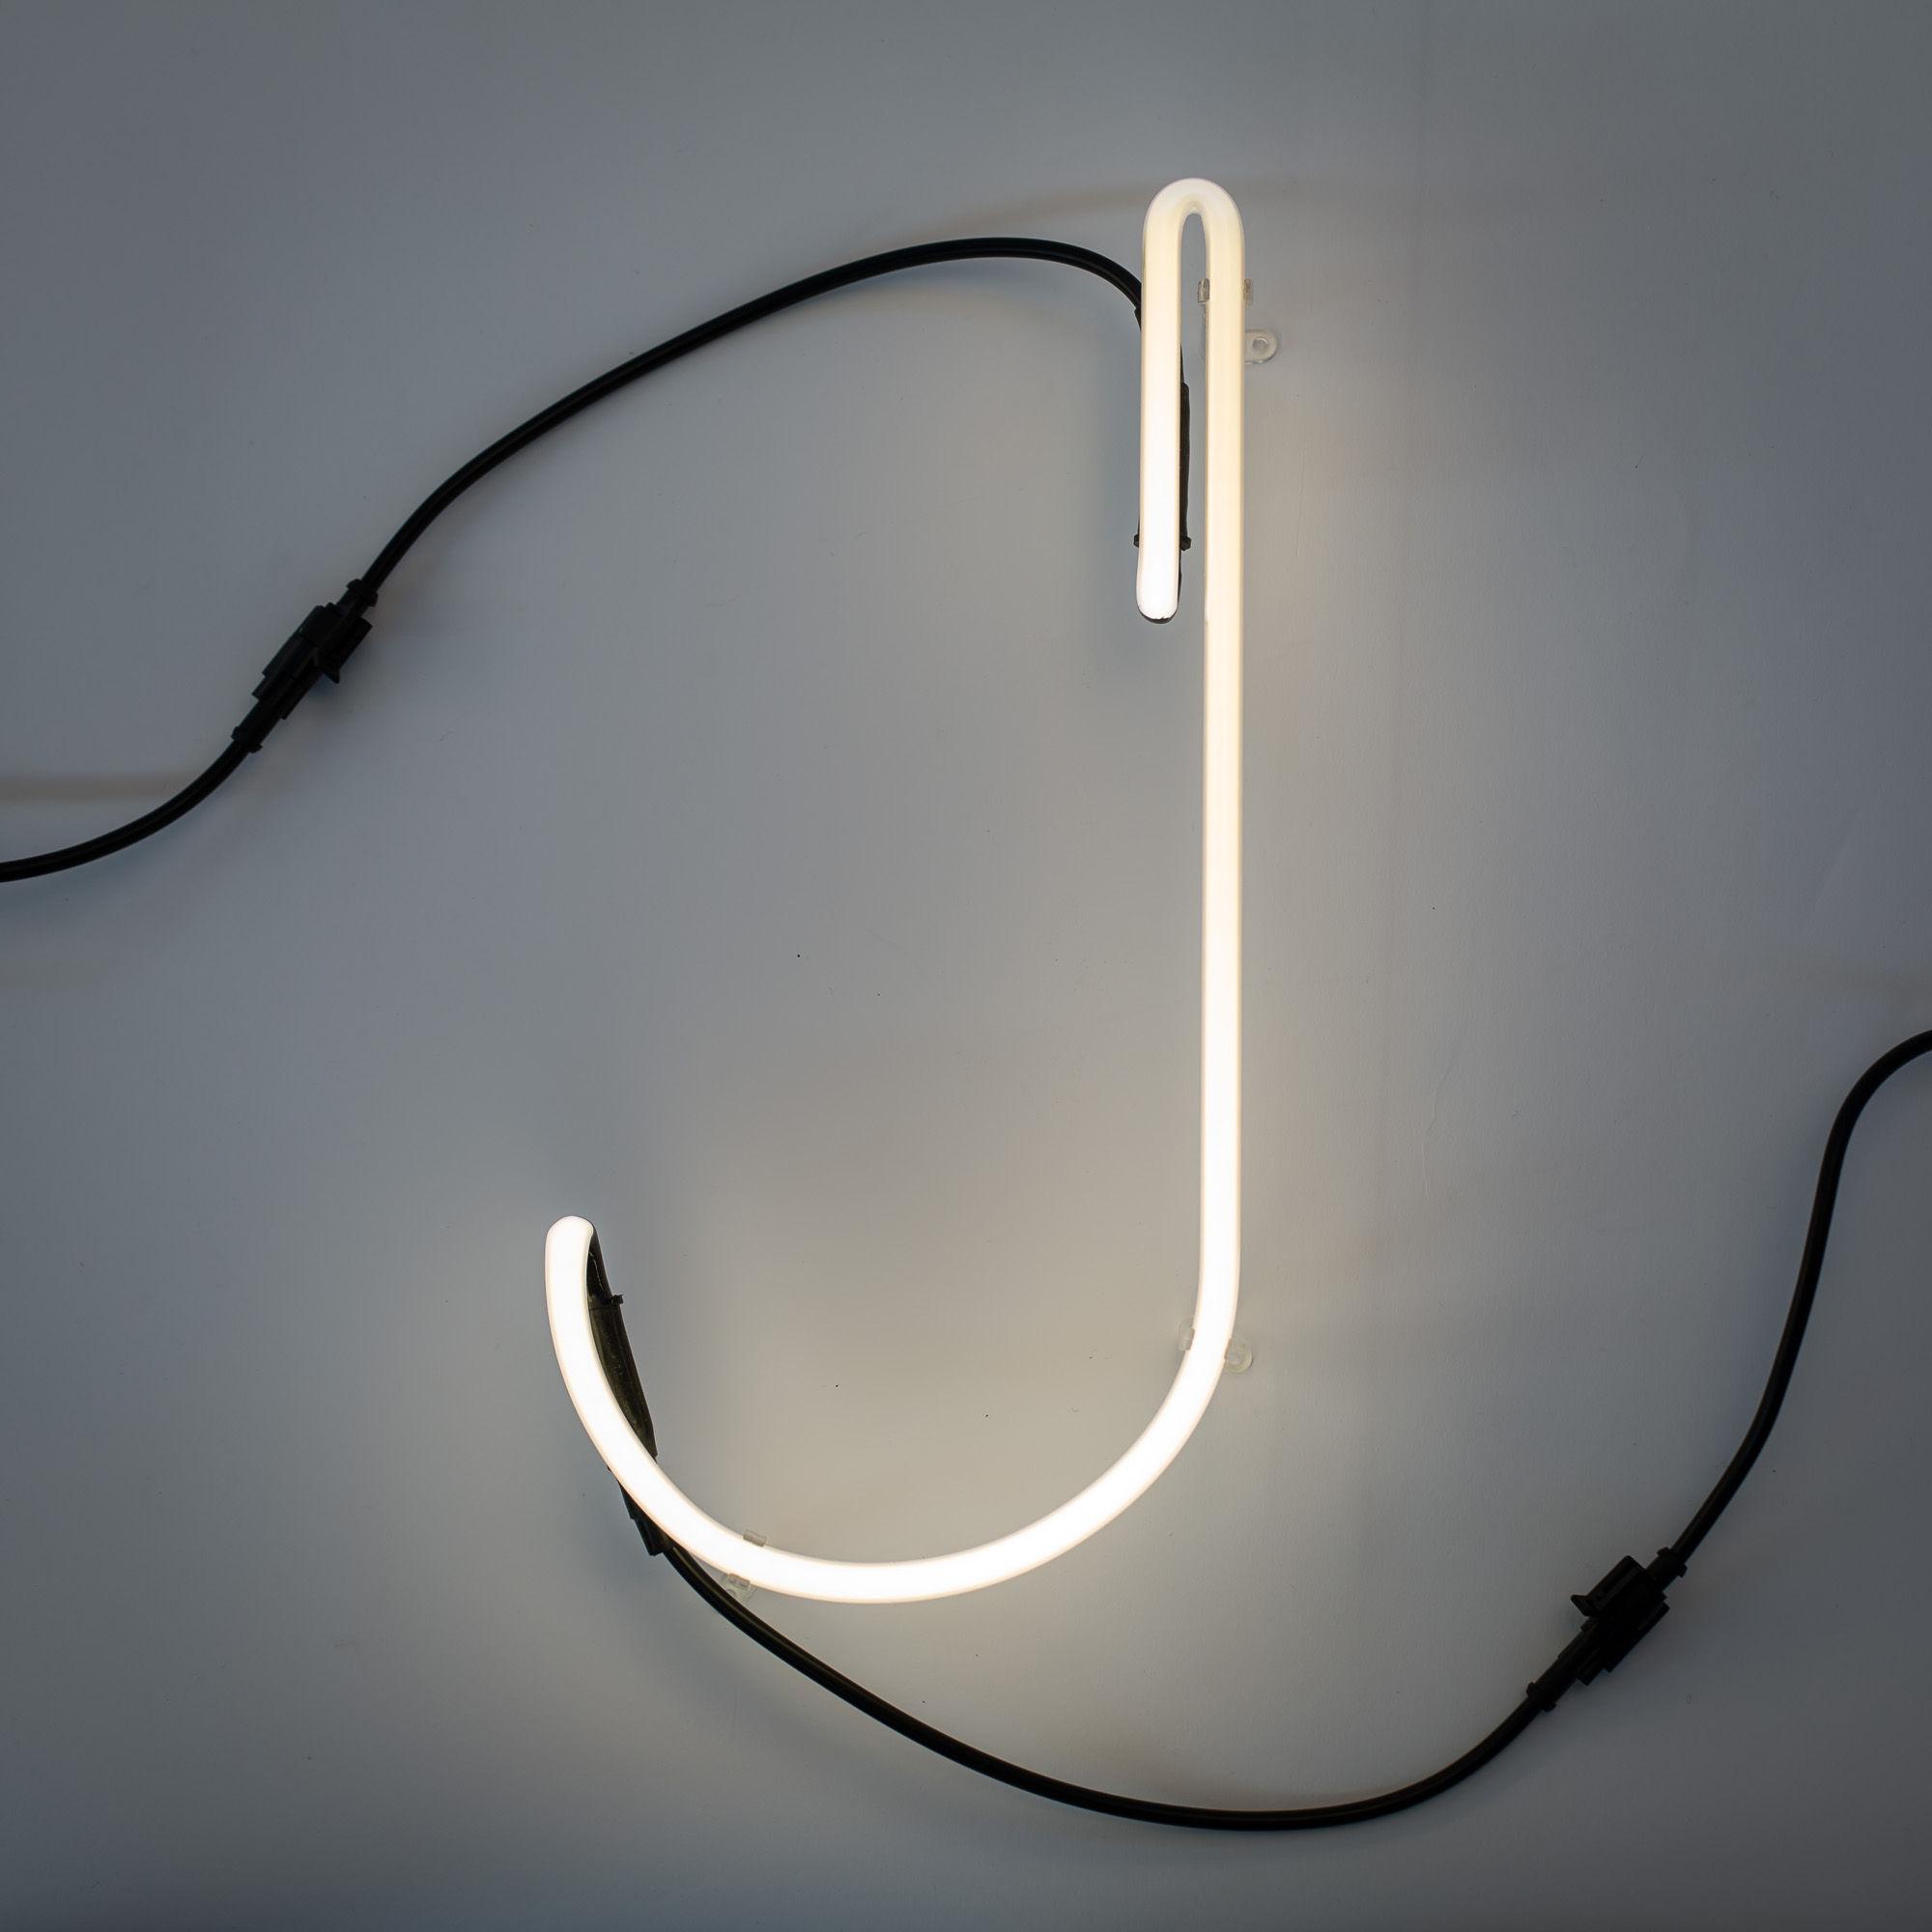 Lighting - Wall Lights - Néon Alphafont Wall light with plug - Letter J by Seletti - J - Glass